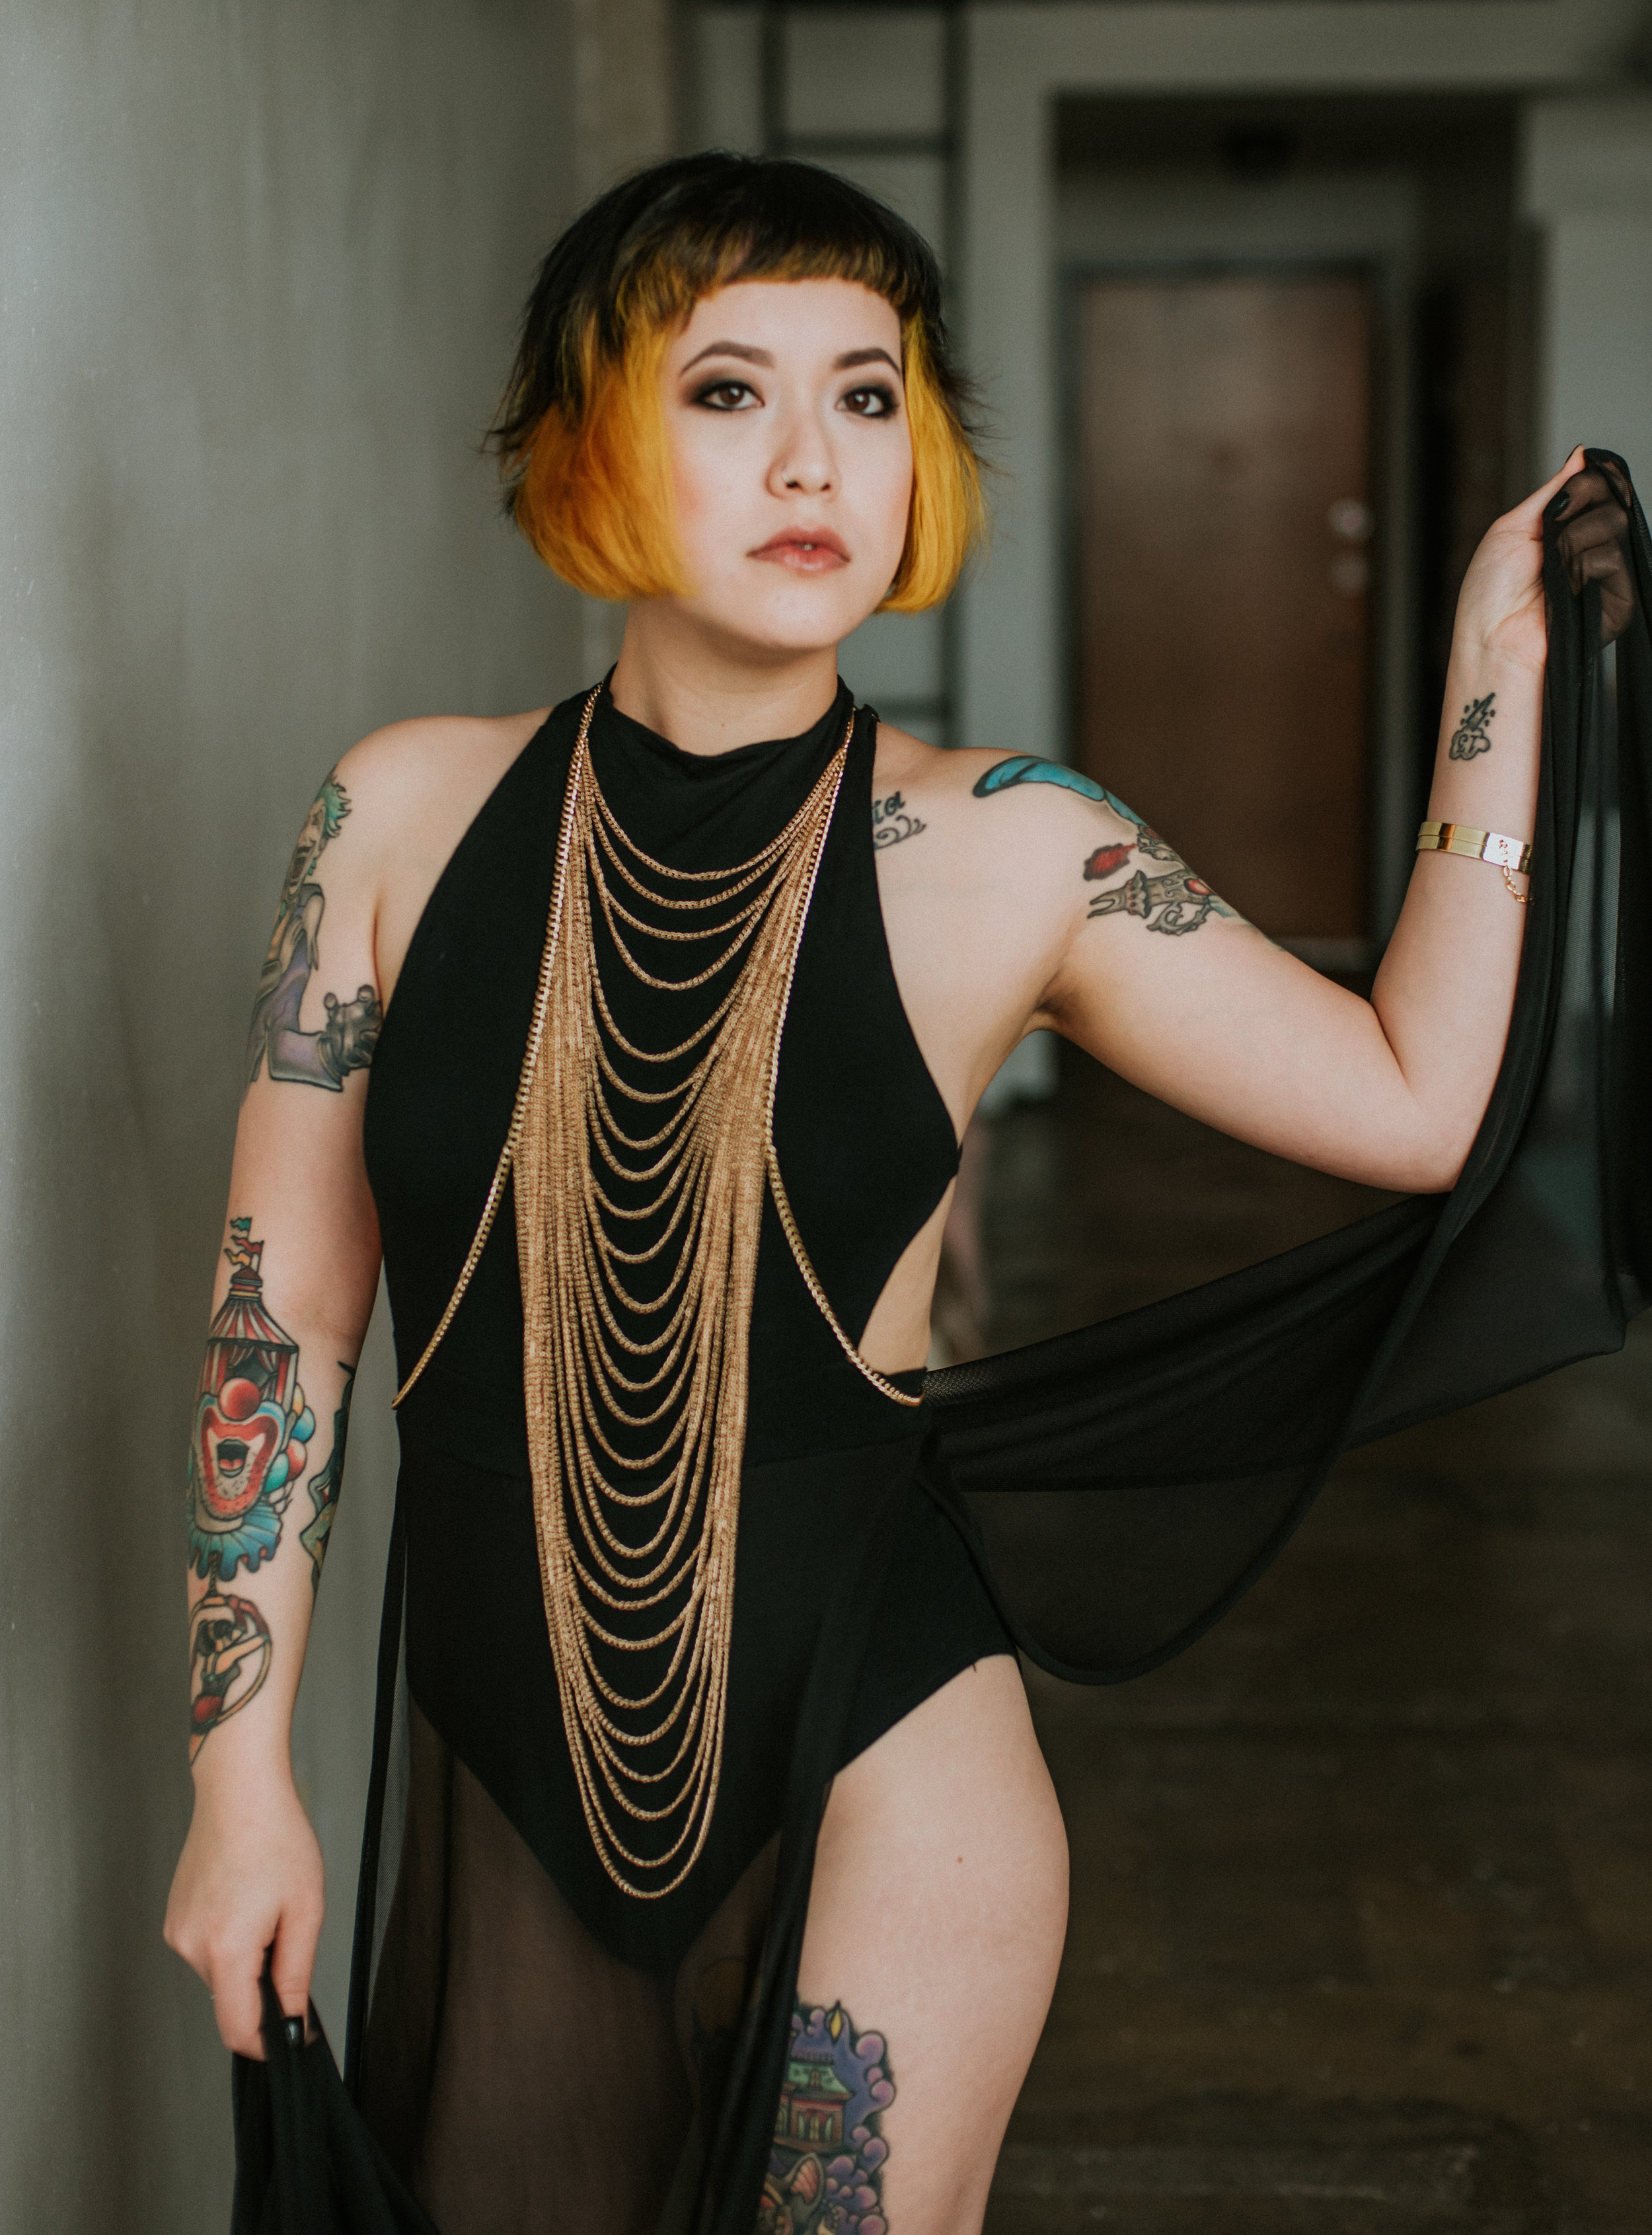 Dark beauty boudoir session in Dallas Texas